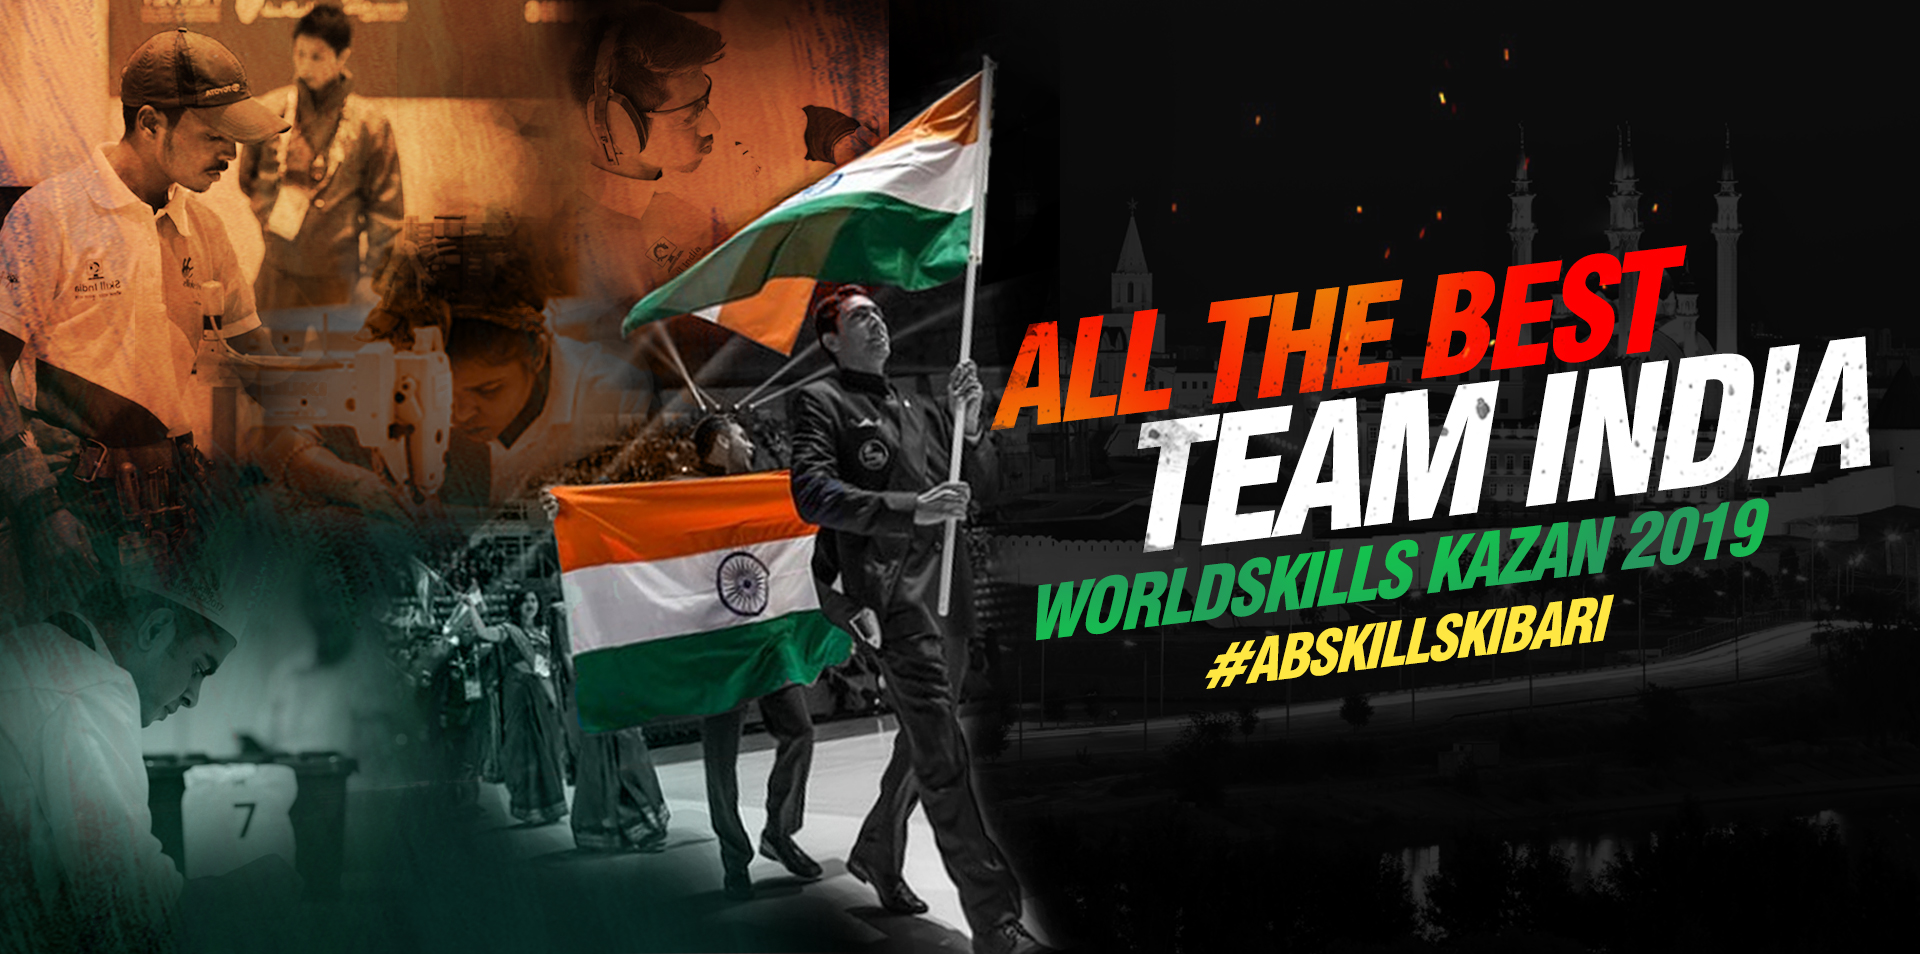 WorldSkills India